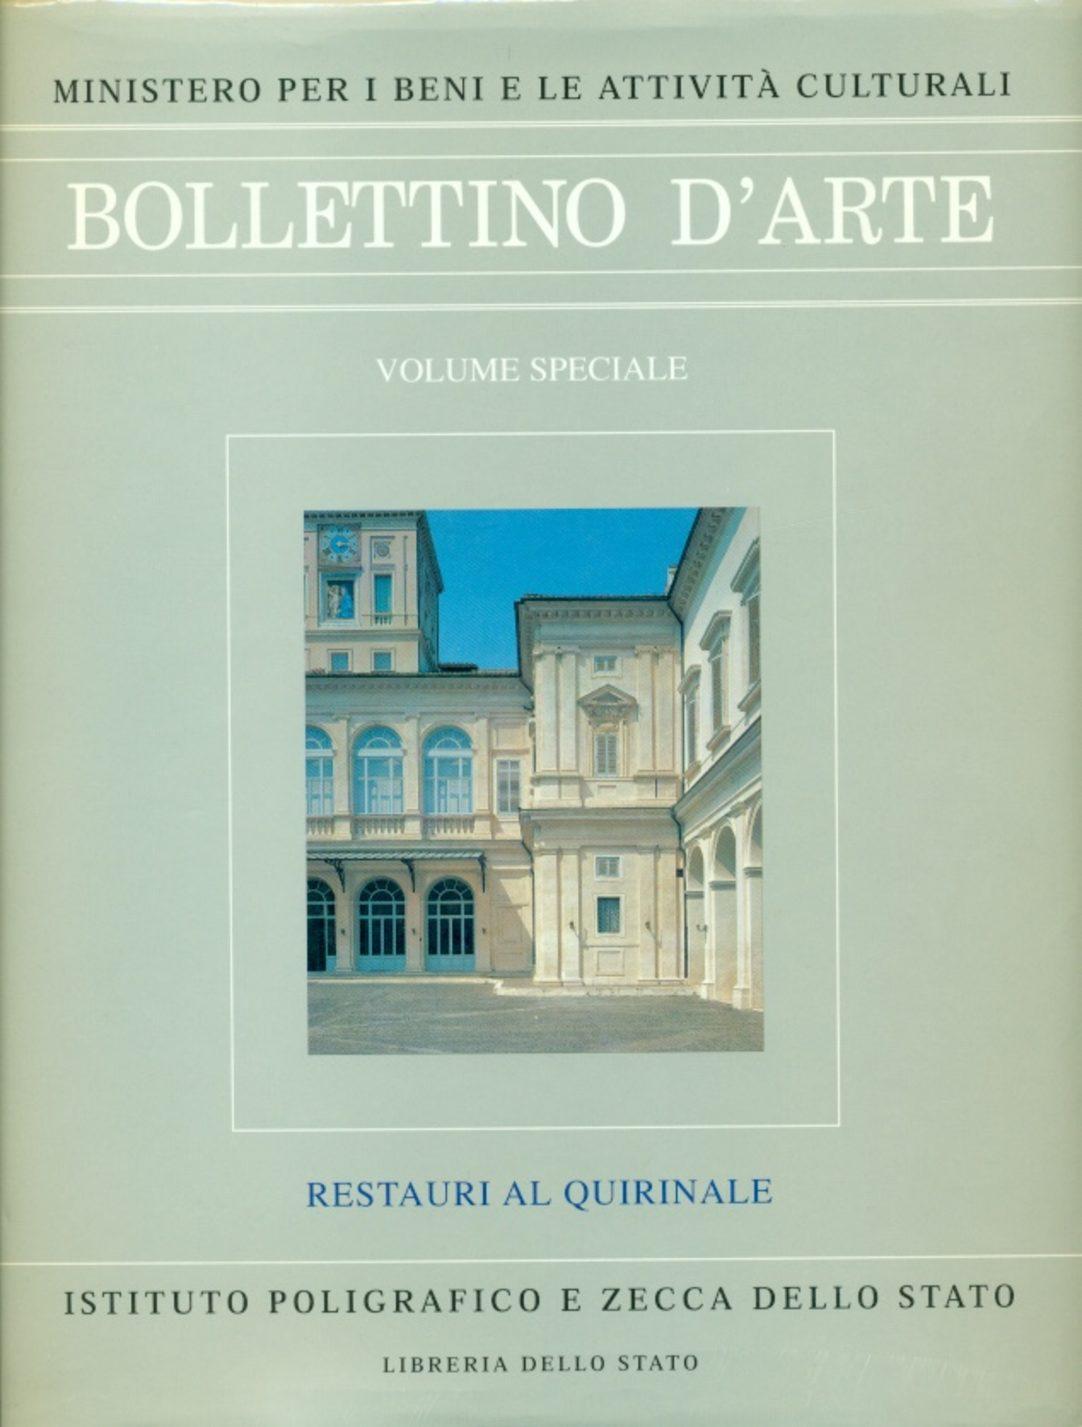 https://cbccoop.it/app/uploads/2017/06/COP-Sala-delle-Dame-e-Alessandro-VII-pdf.jpg